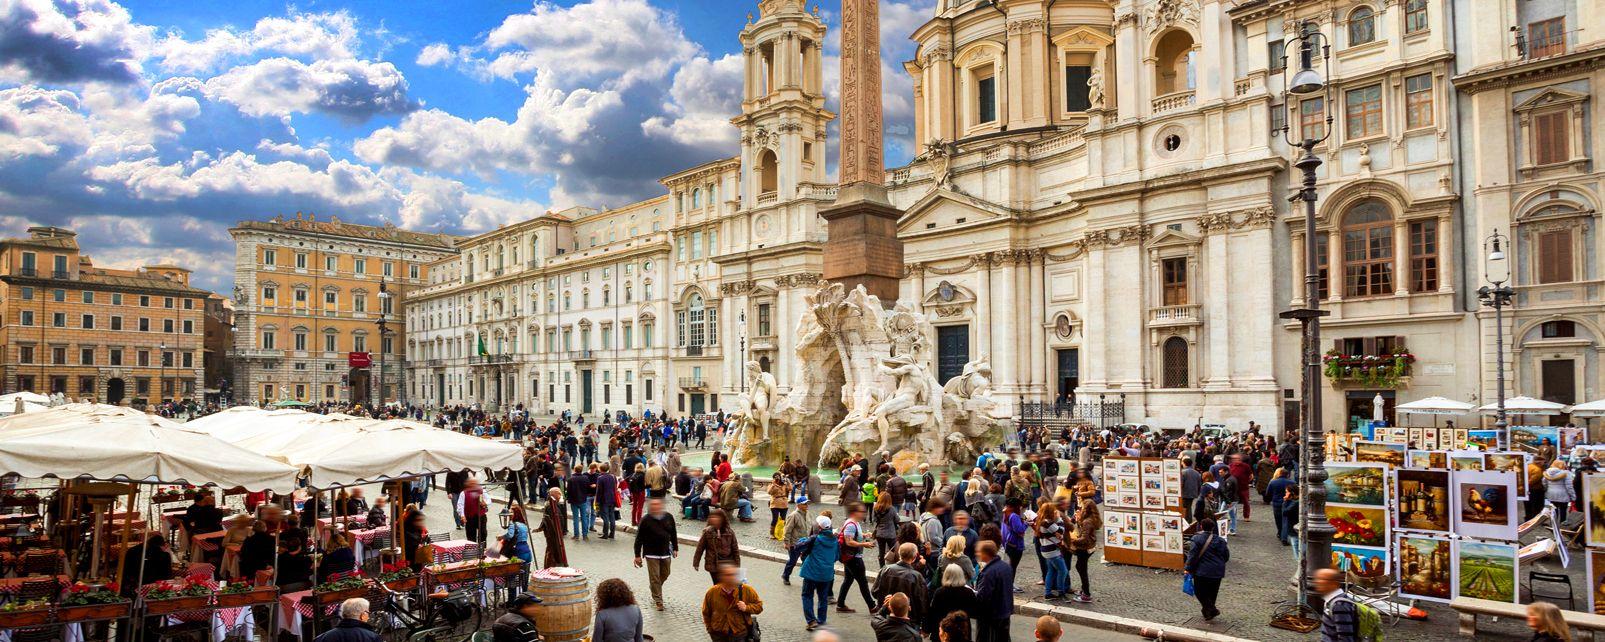 ROMA , Piazza Navona , Italia